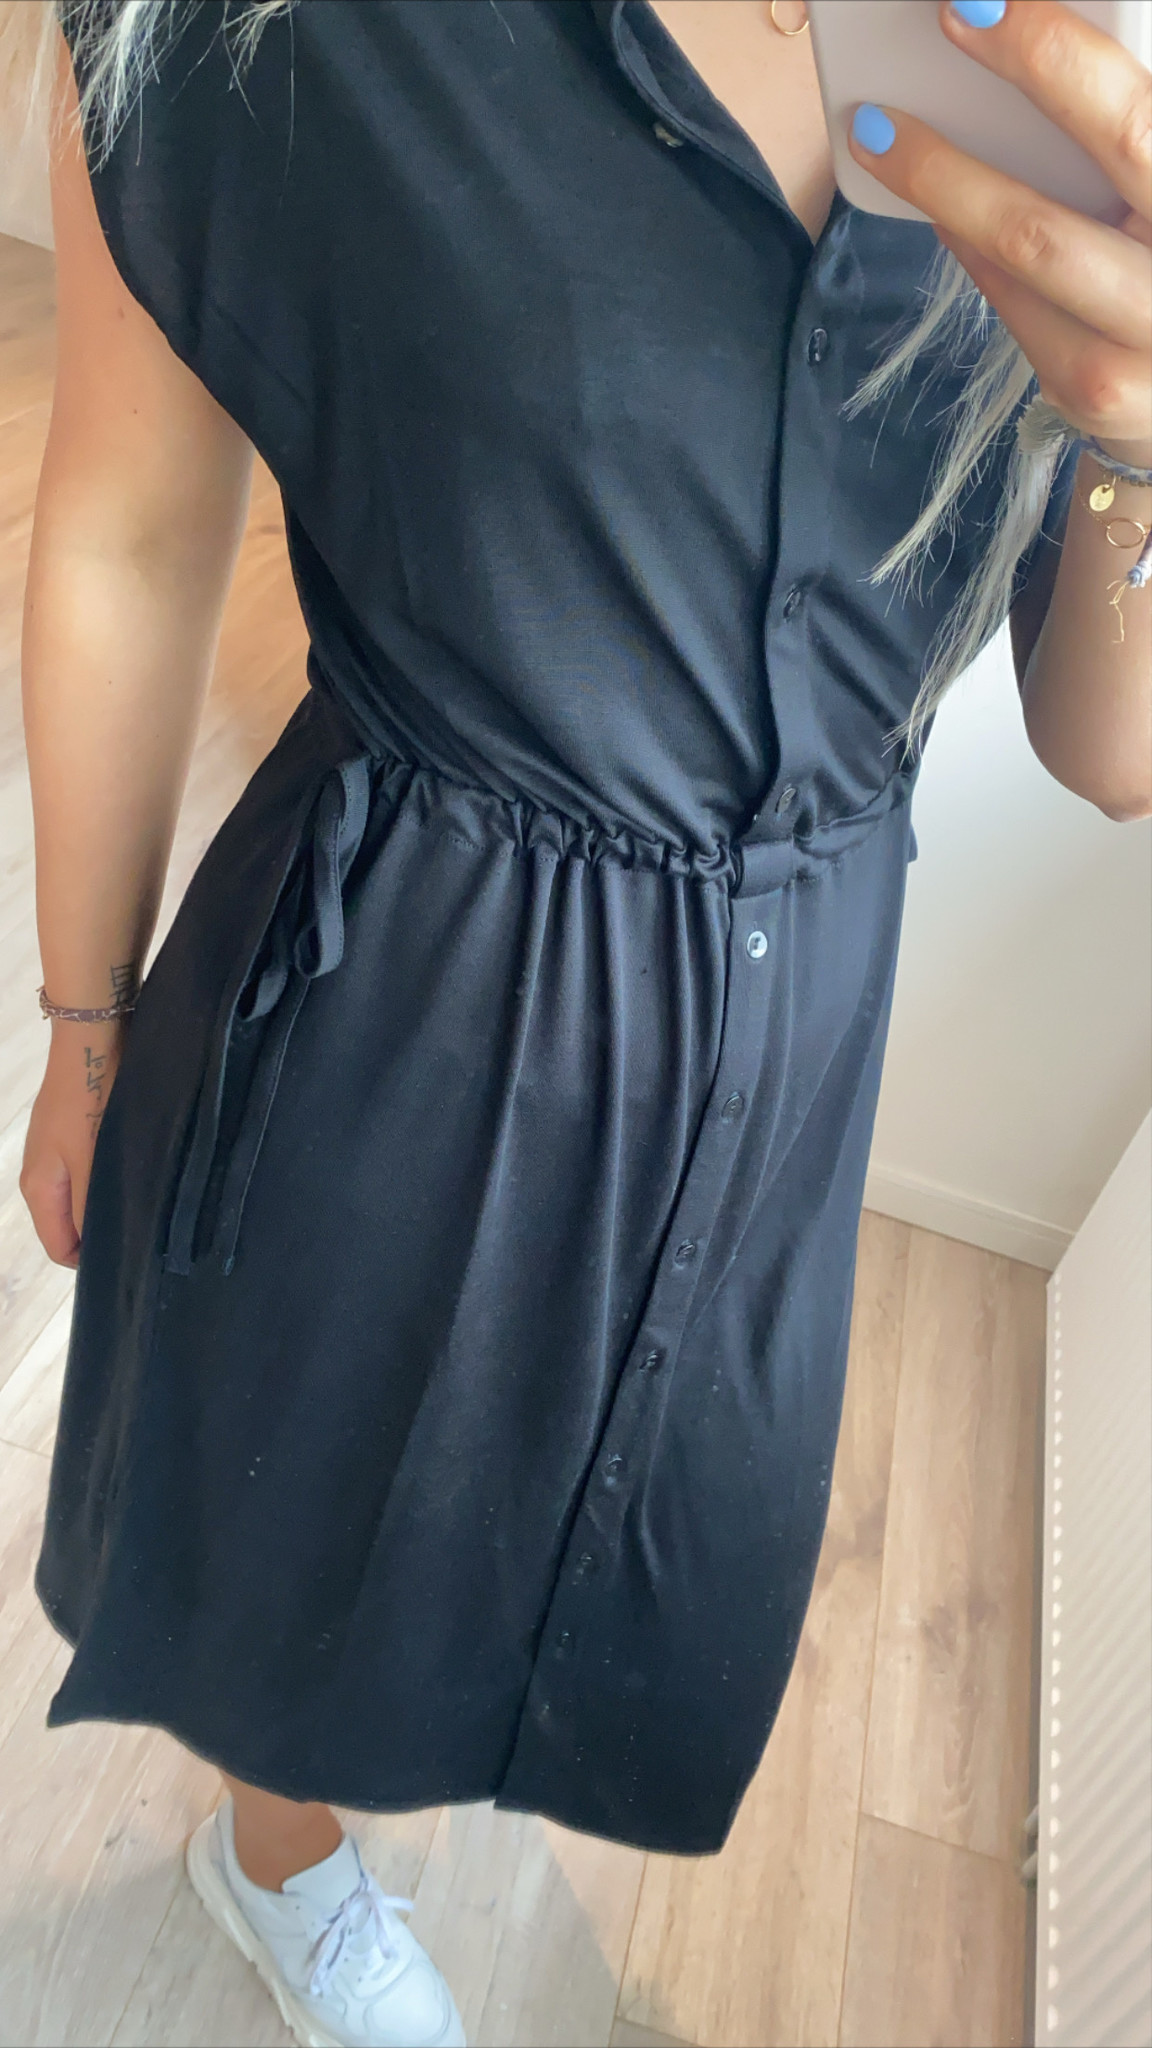 Jurk agnes dress black-4